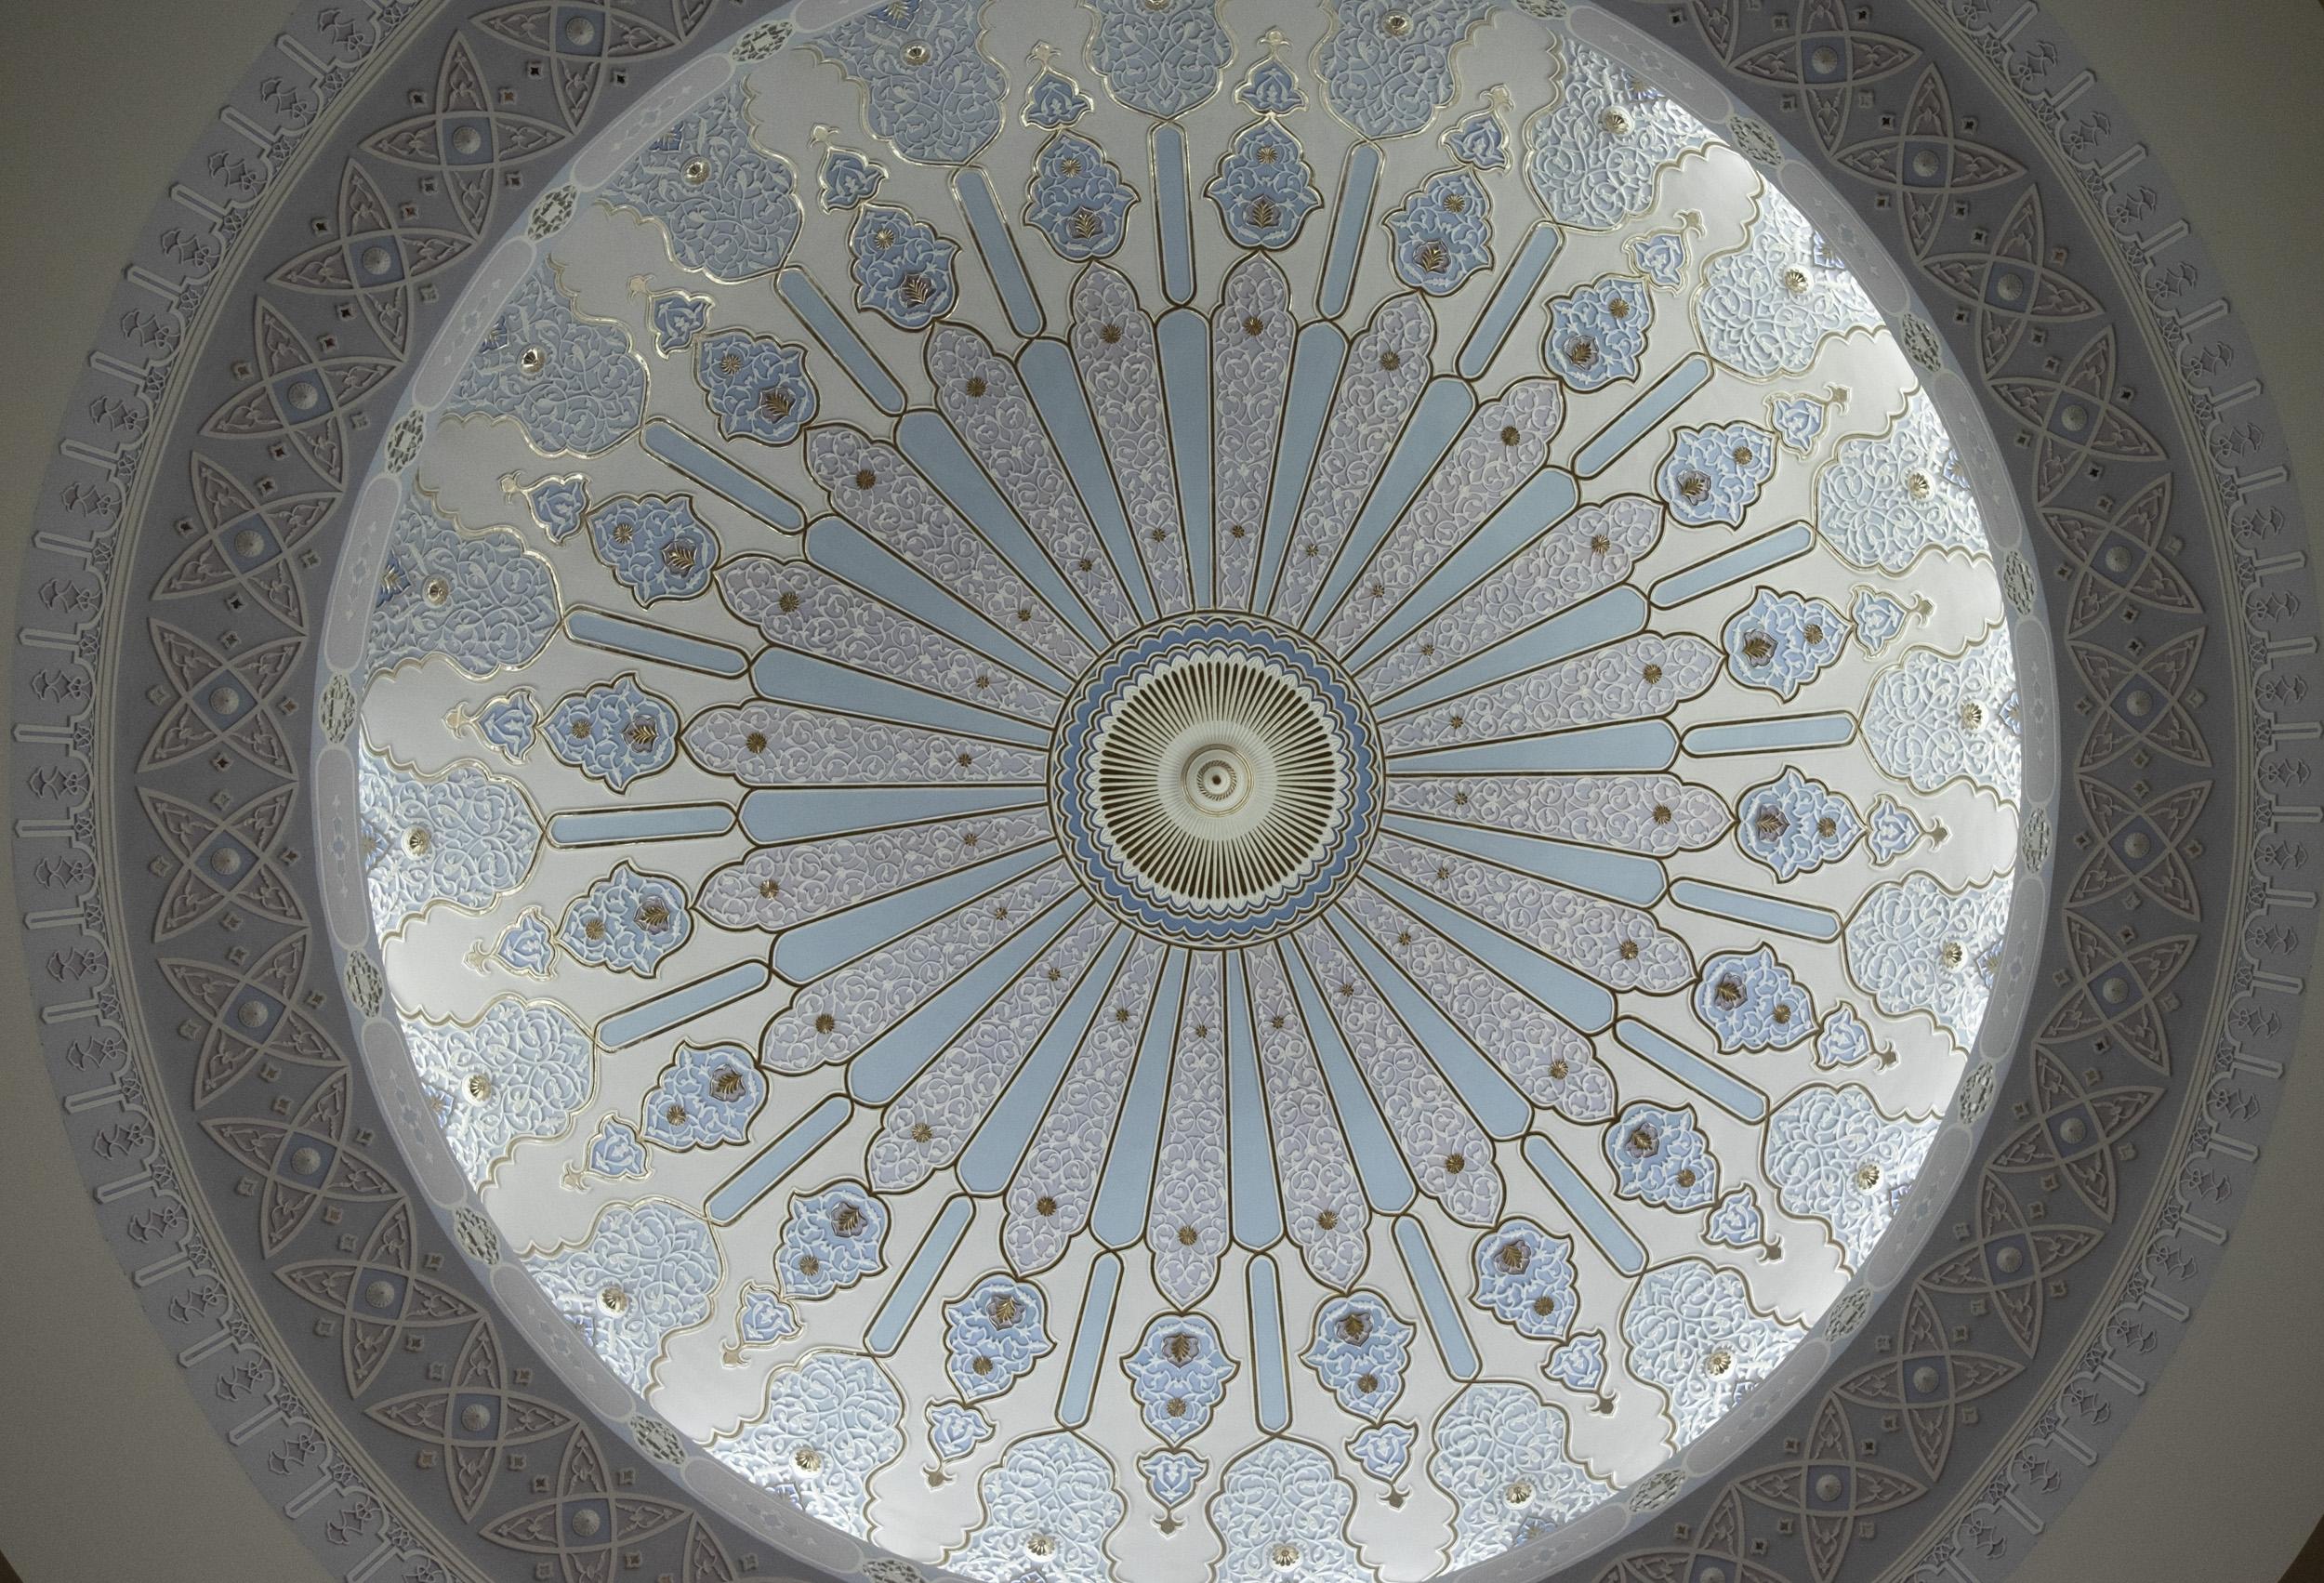 160325_islamic_arts_museum_malaysia_05.jpg